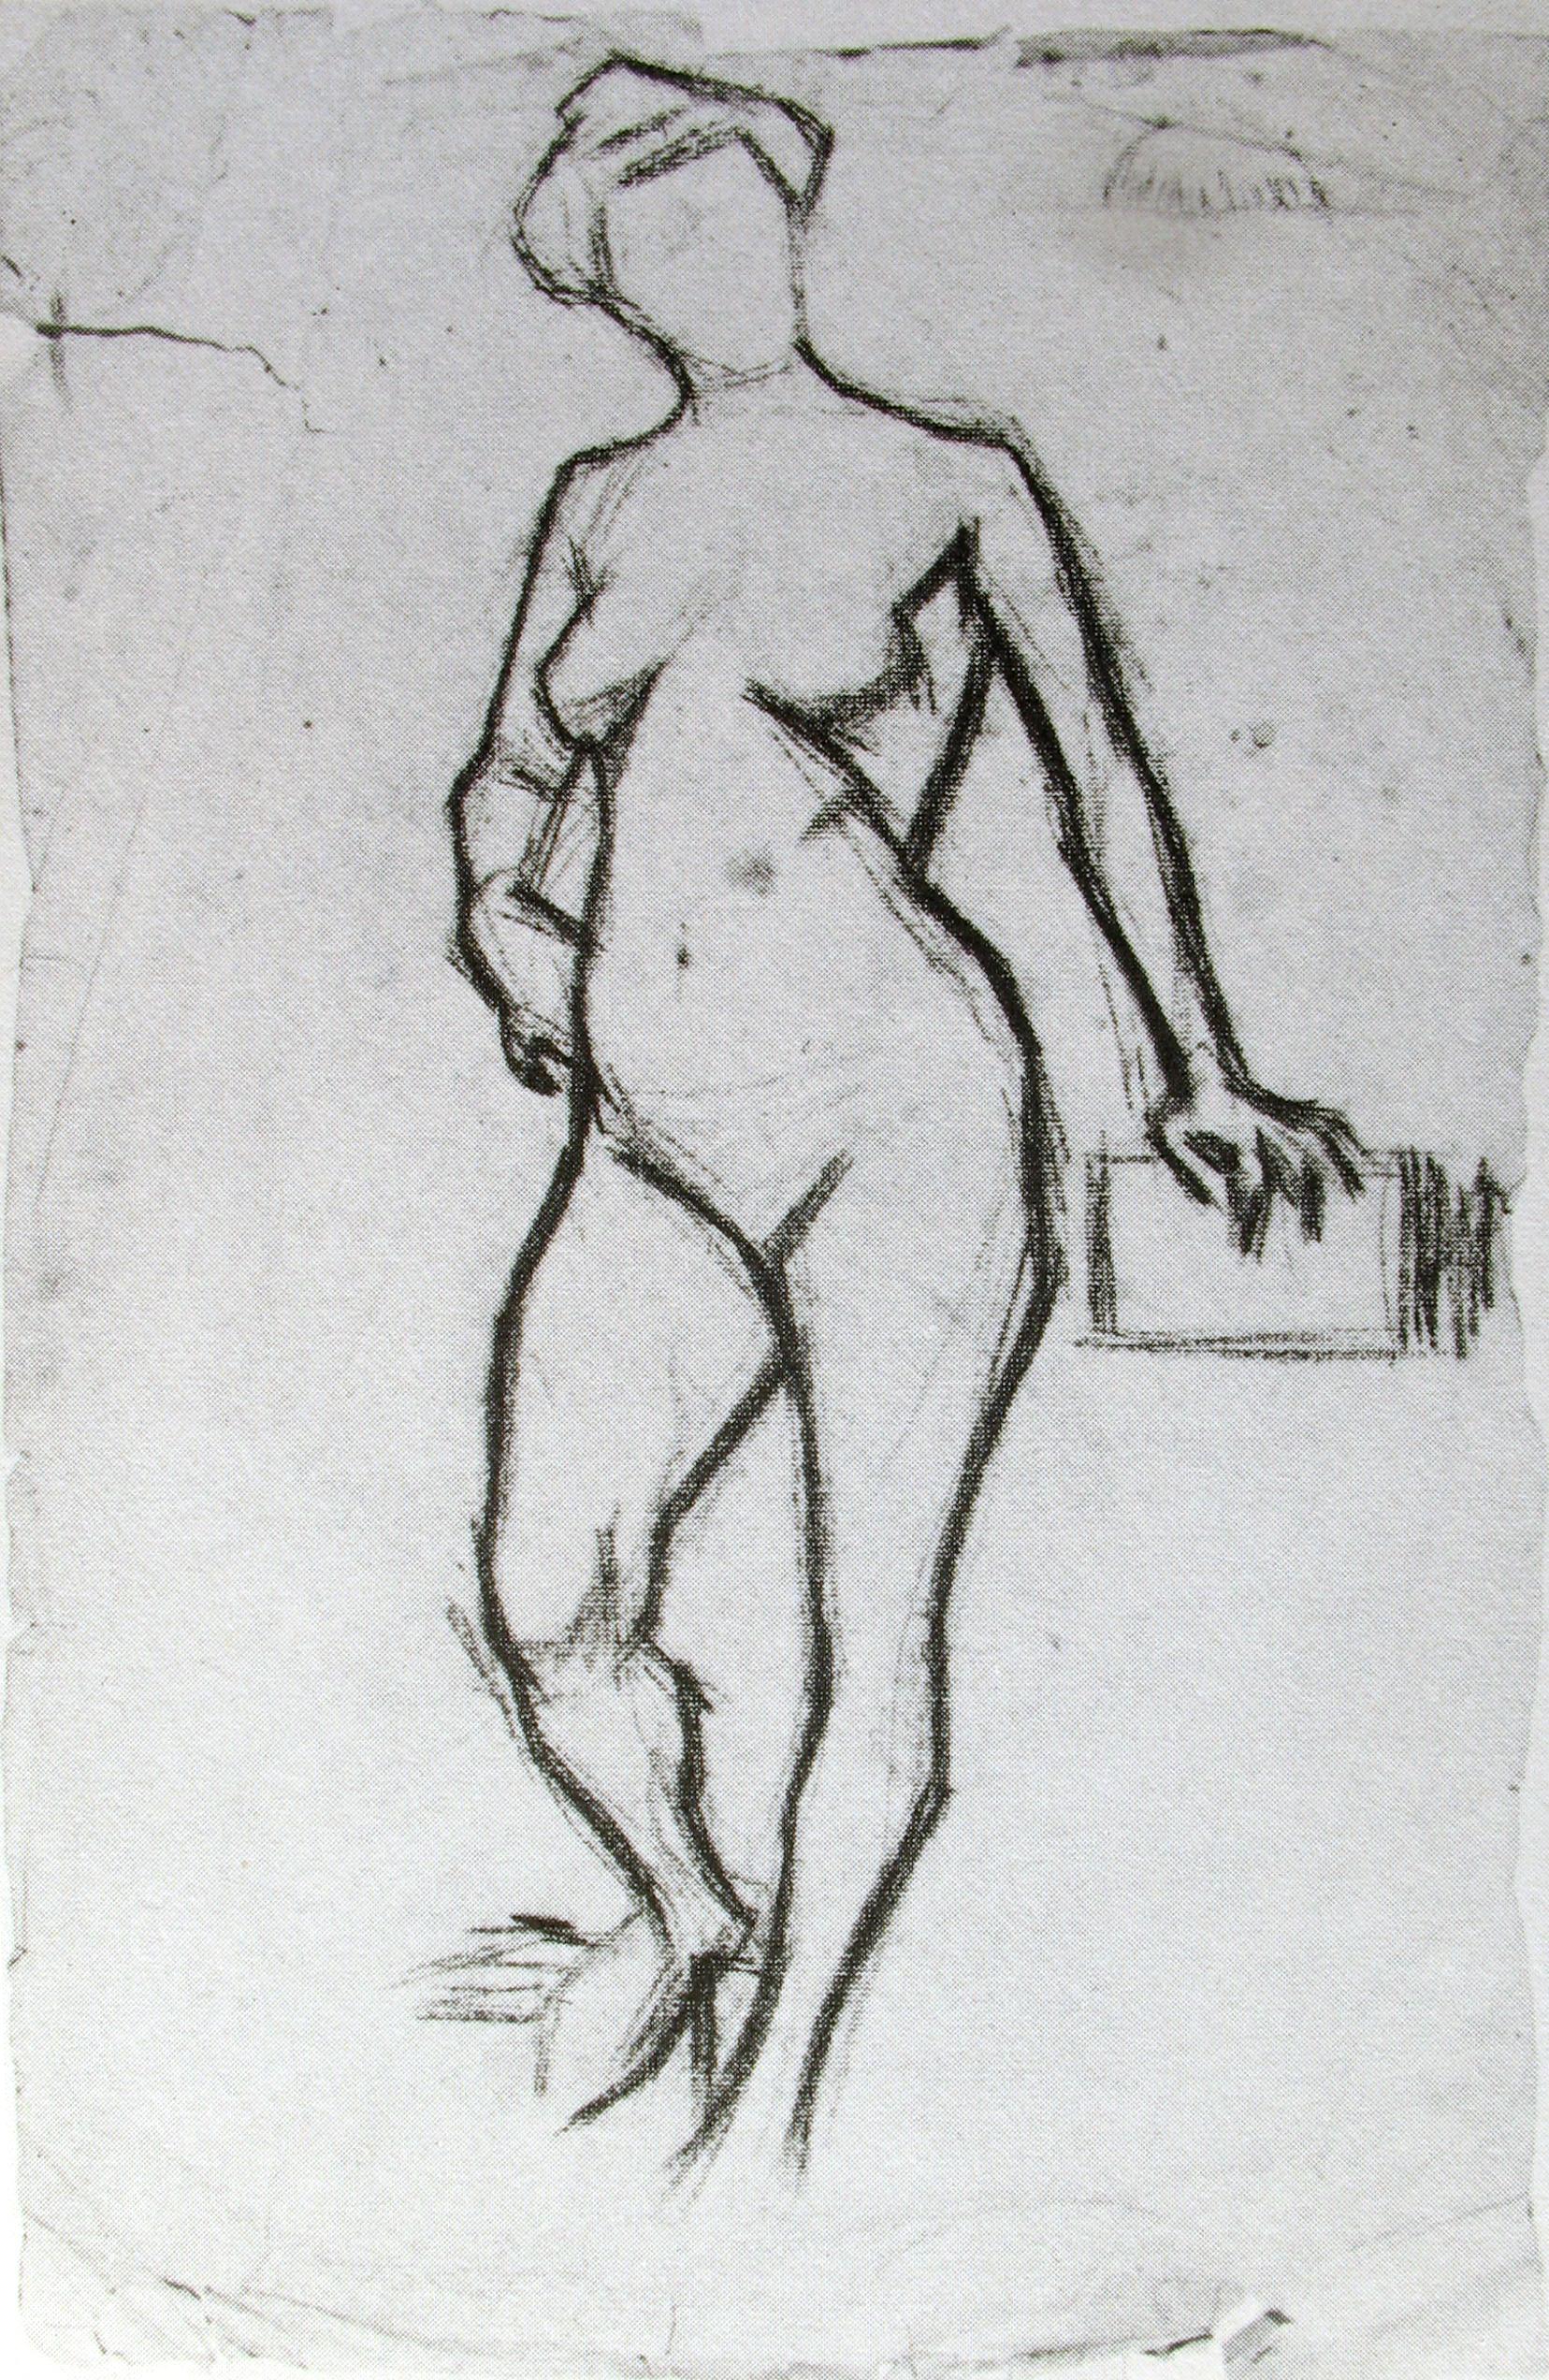 Pablo Picasso - croquis - nude 1